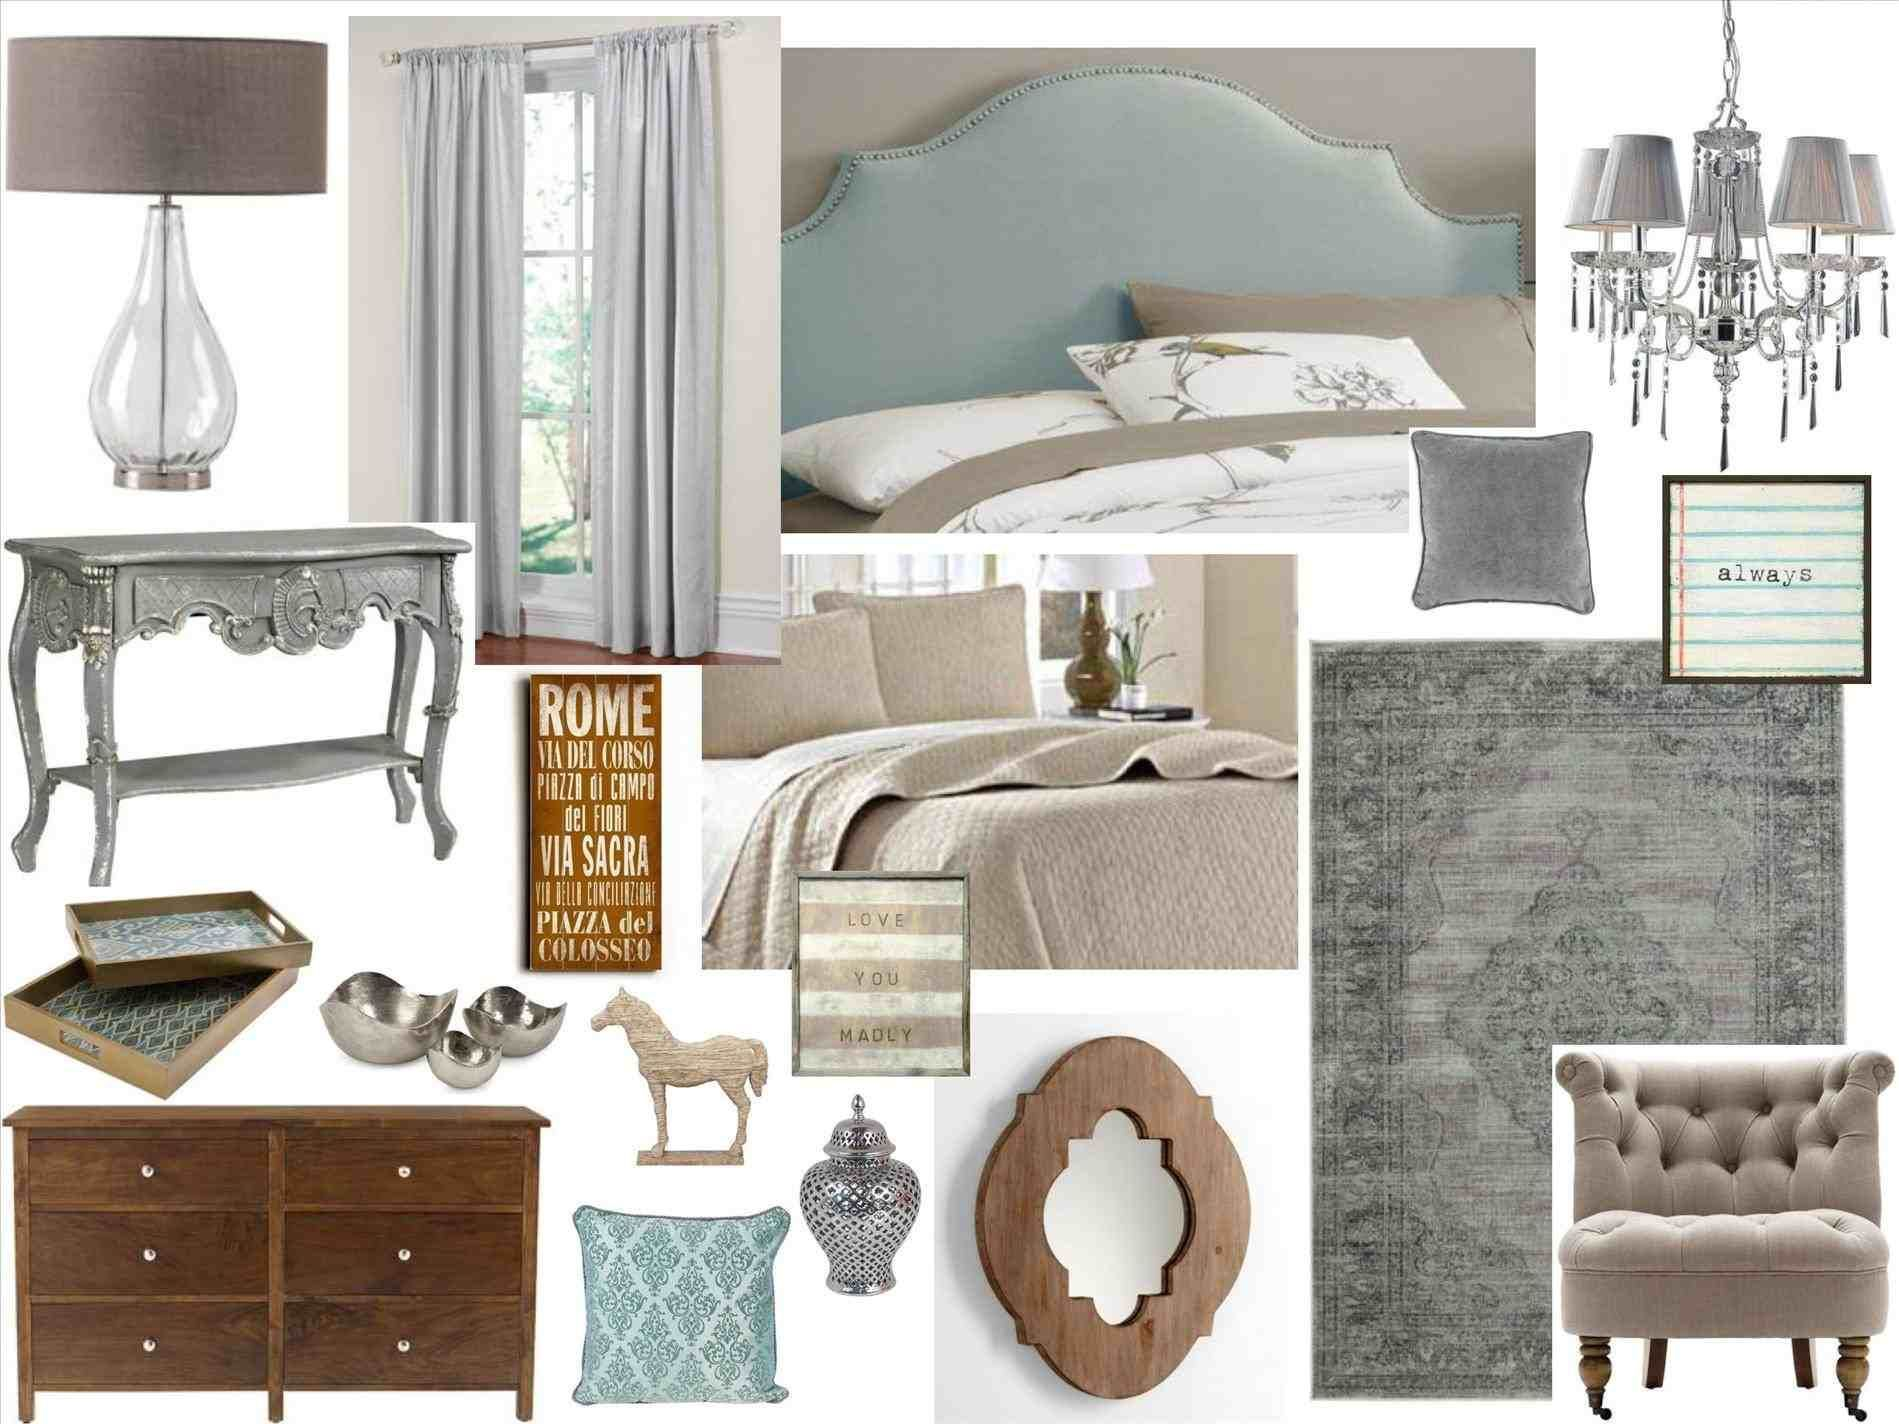 New Post home decor ideas diy pinterest visit Bobayule Trending ...